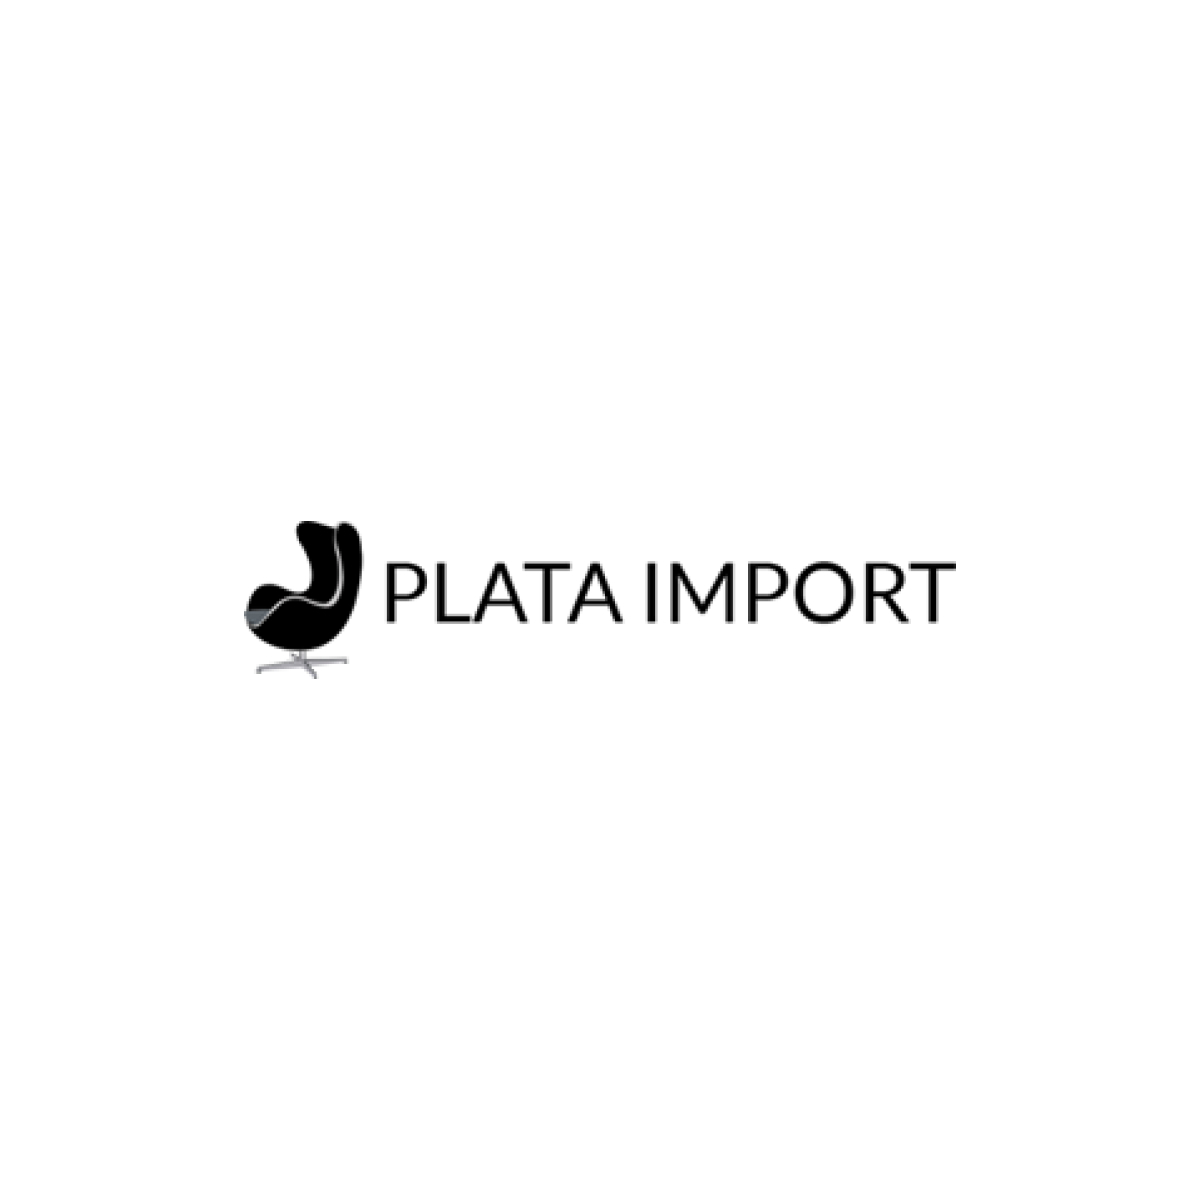 plata_import